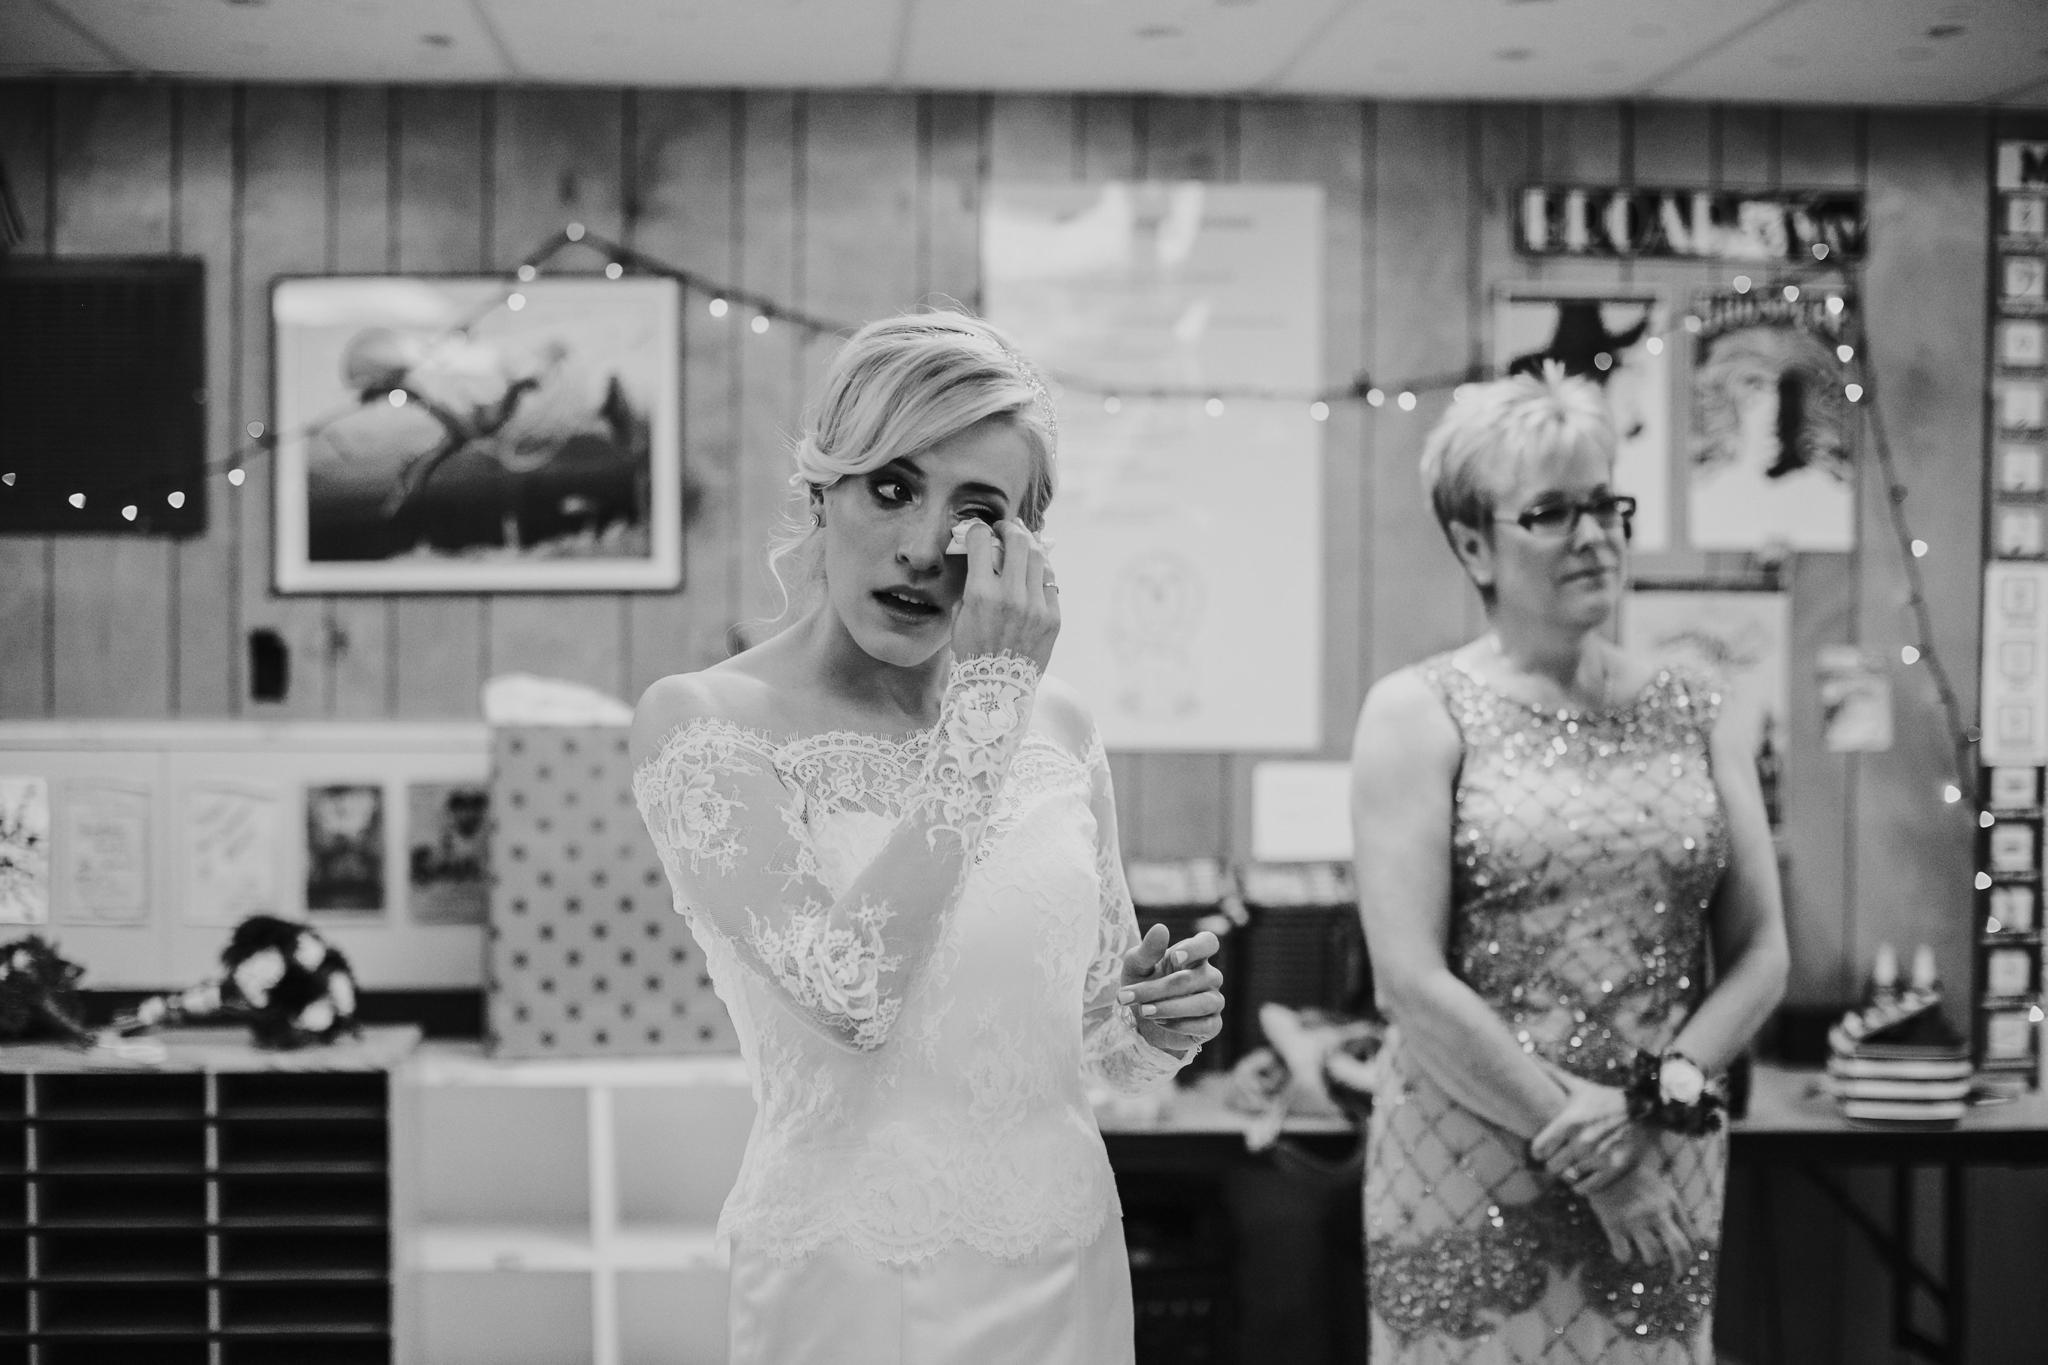 20151230_hussem_wedding_0143_web.jpg